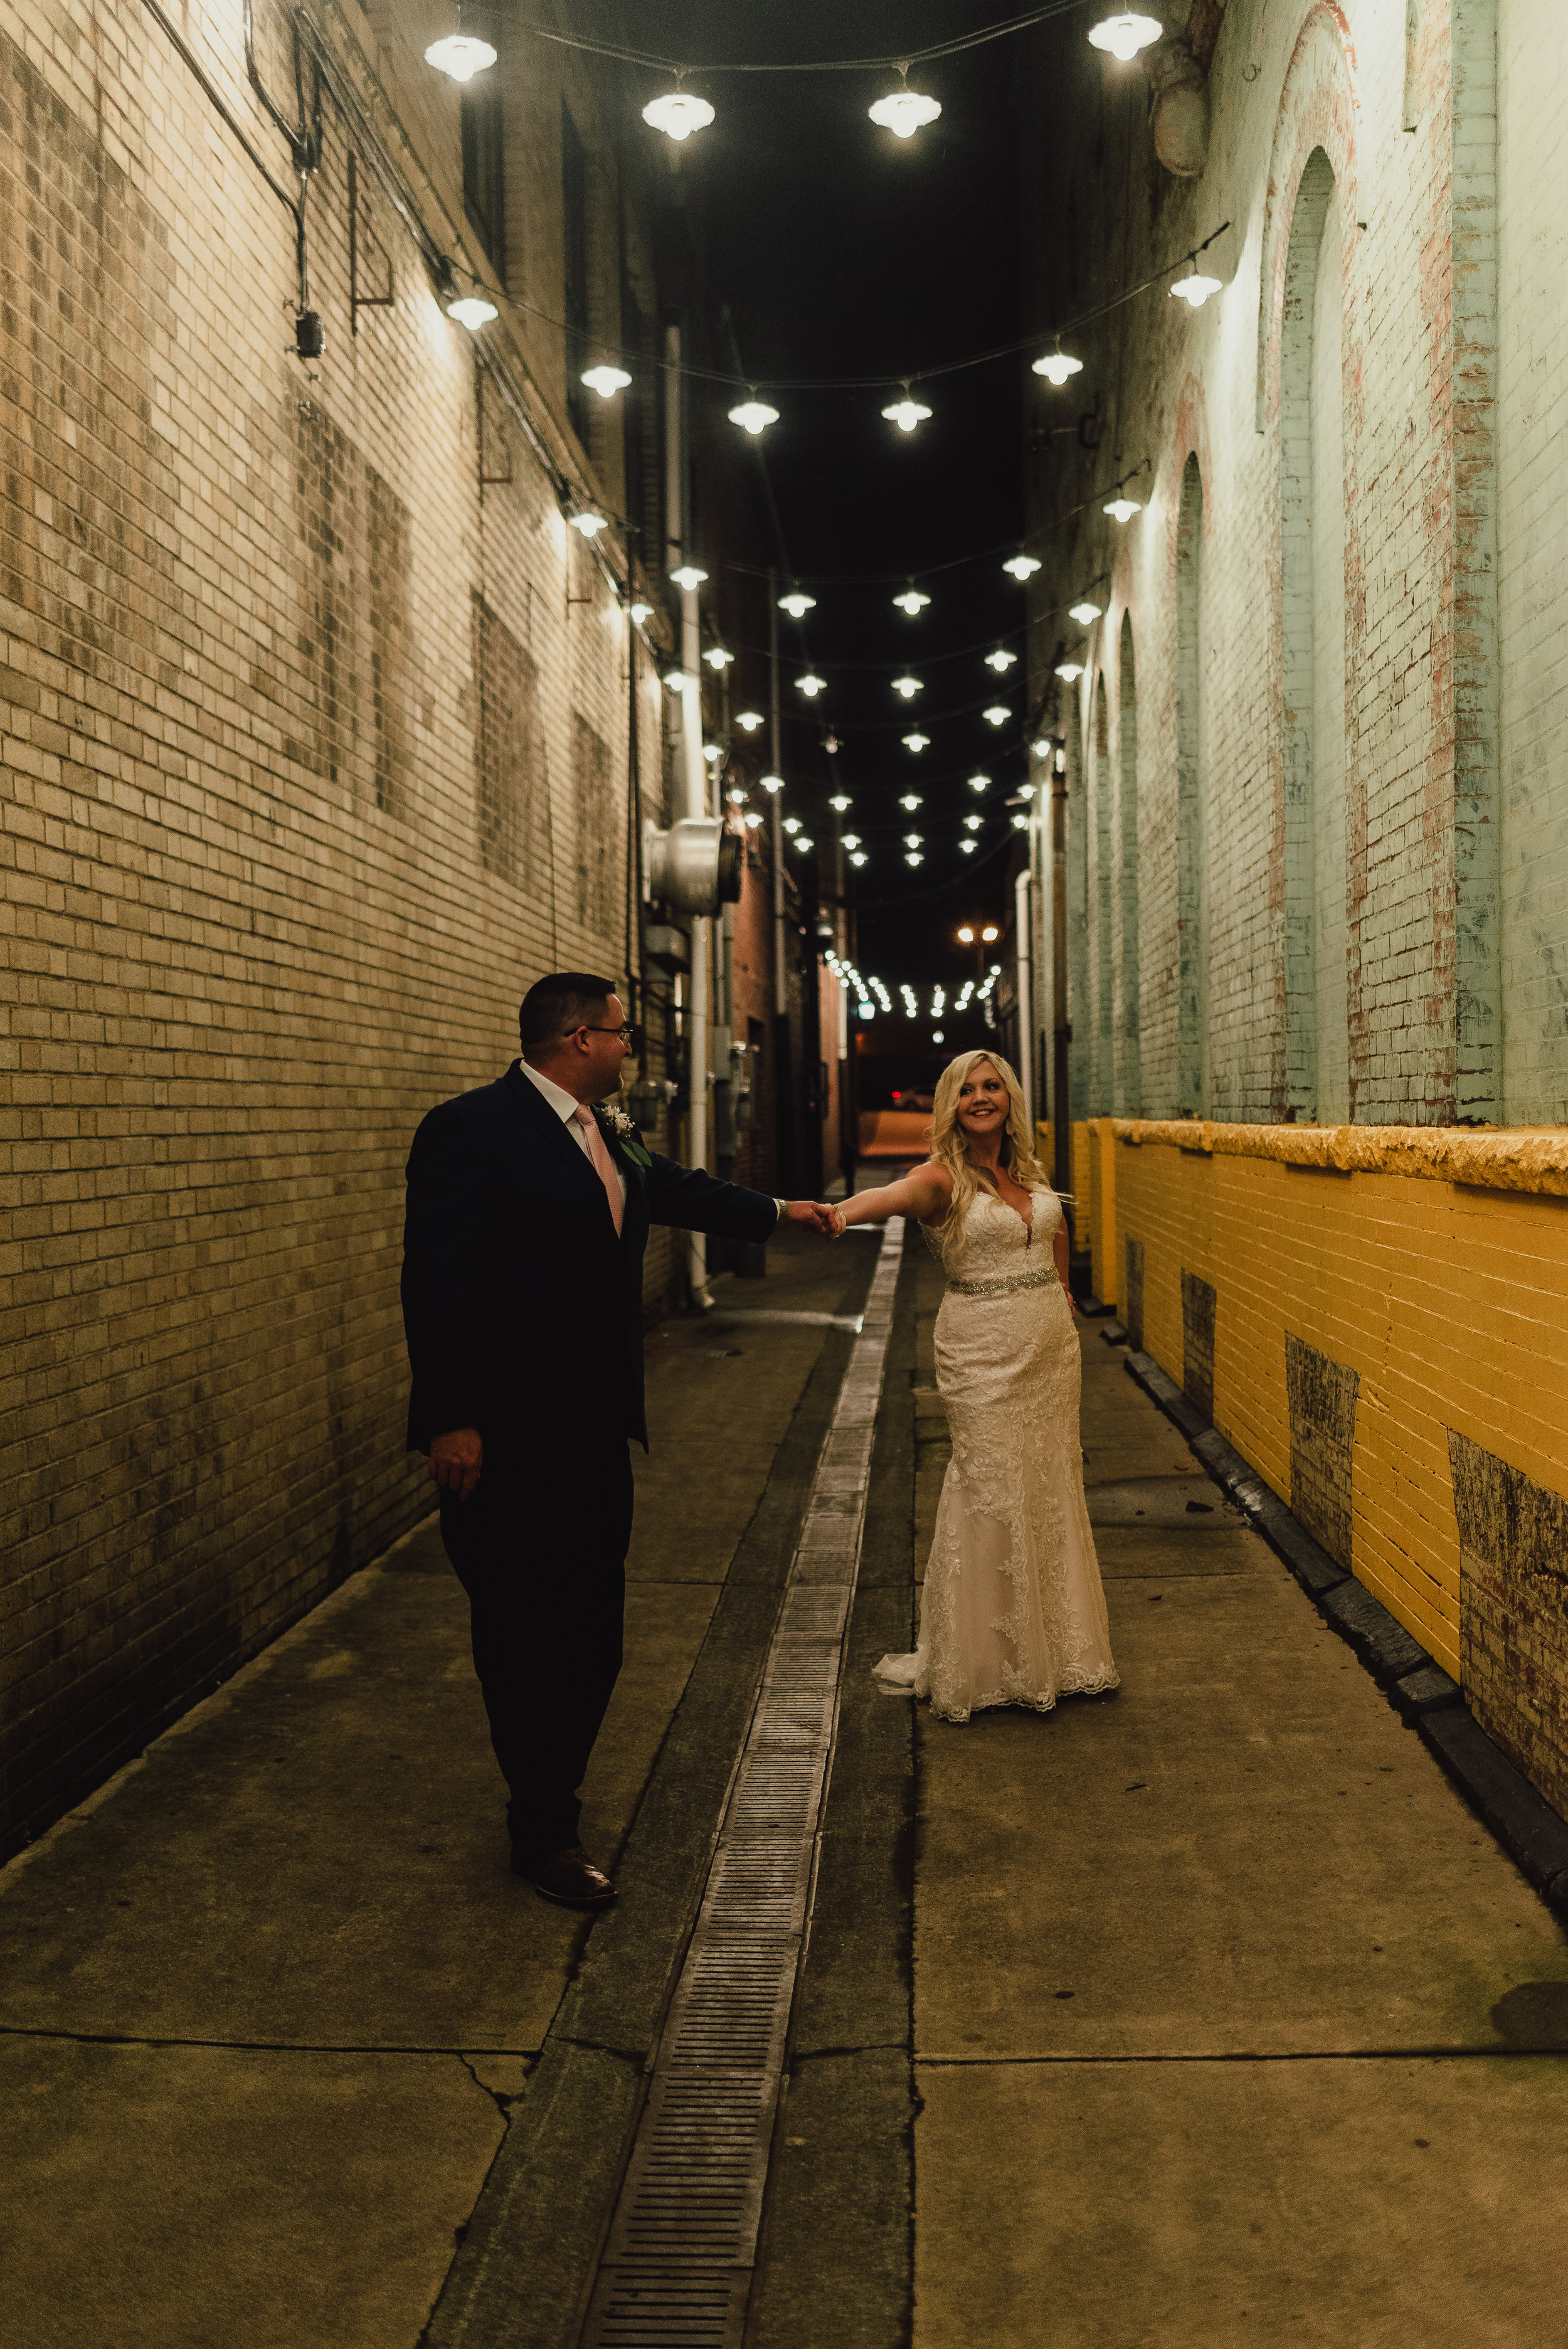 east-tn-wedding-photographer-tennessee-elopement-photographer-kingsport-tn-wedding-photographer (878 of 1001).jpg